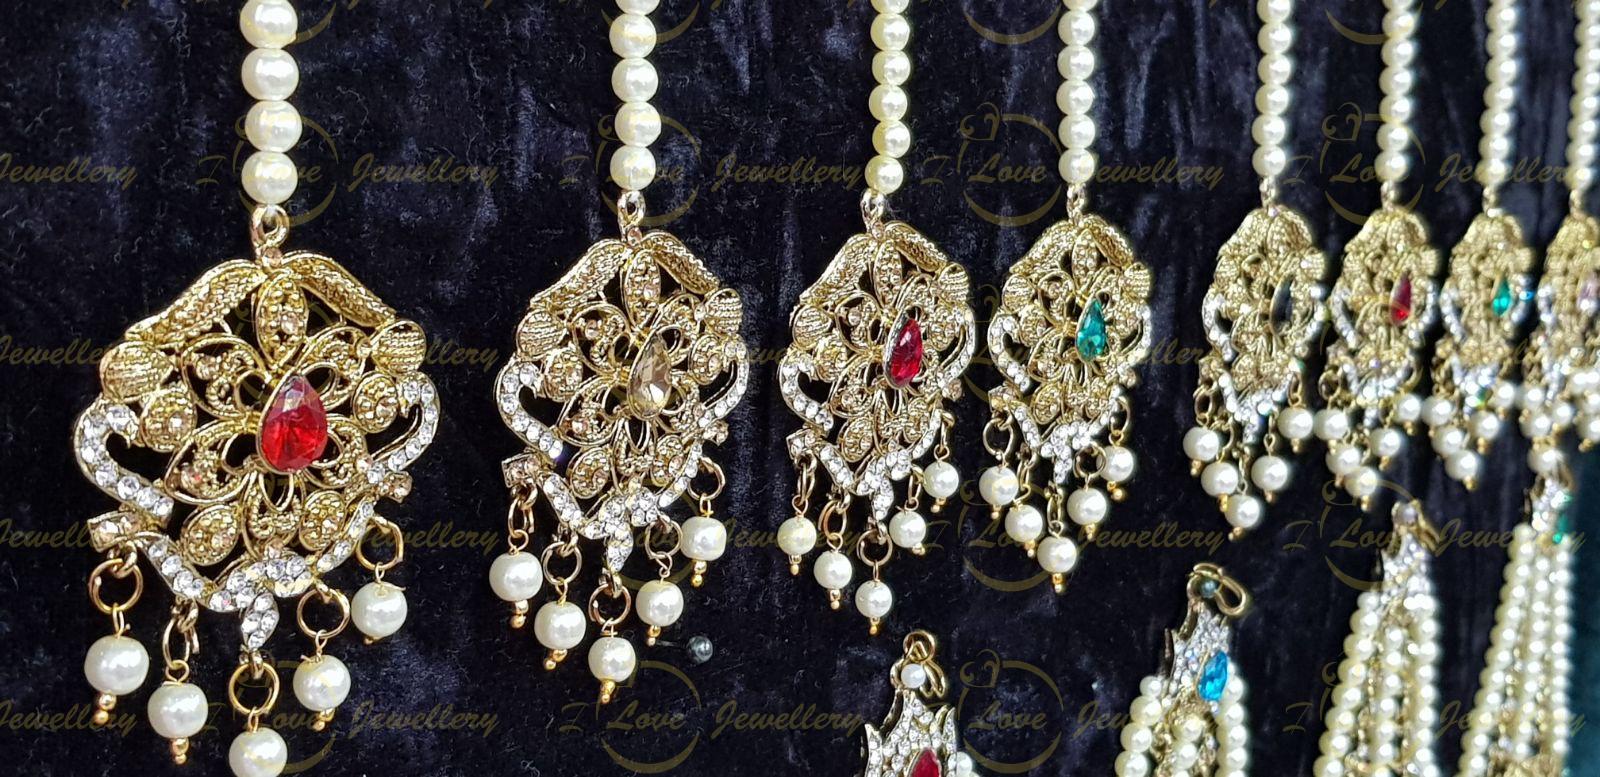 Tikkas - collection of Pakistani jhoomar tikka sets - wholesale Pakistani jewellery - bespoke Pakistani jewellery